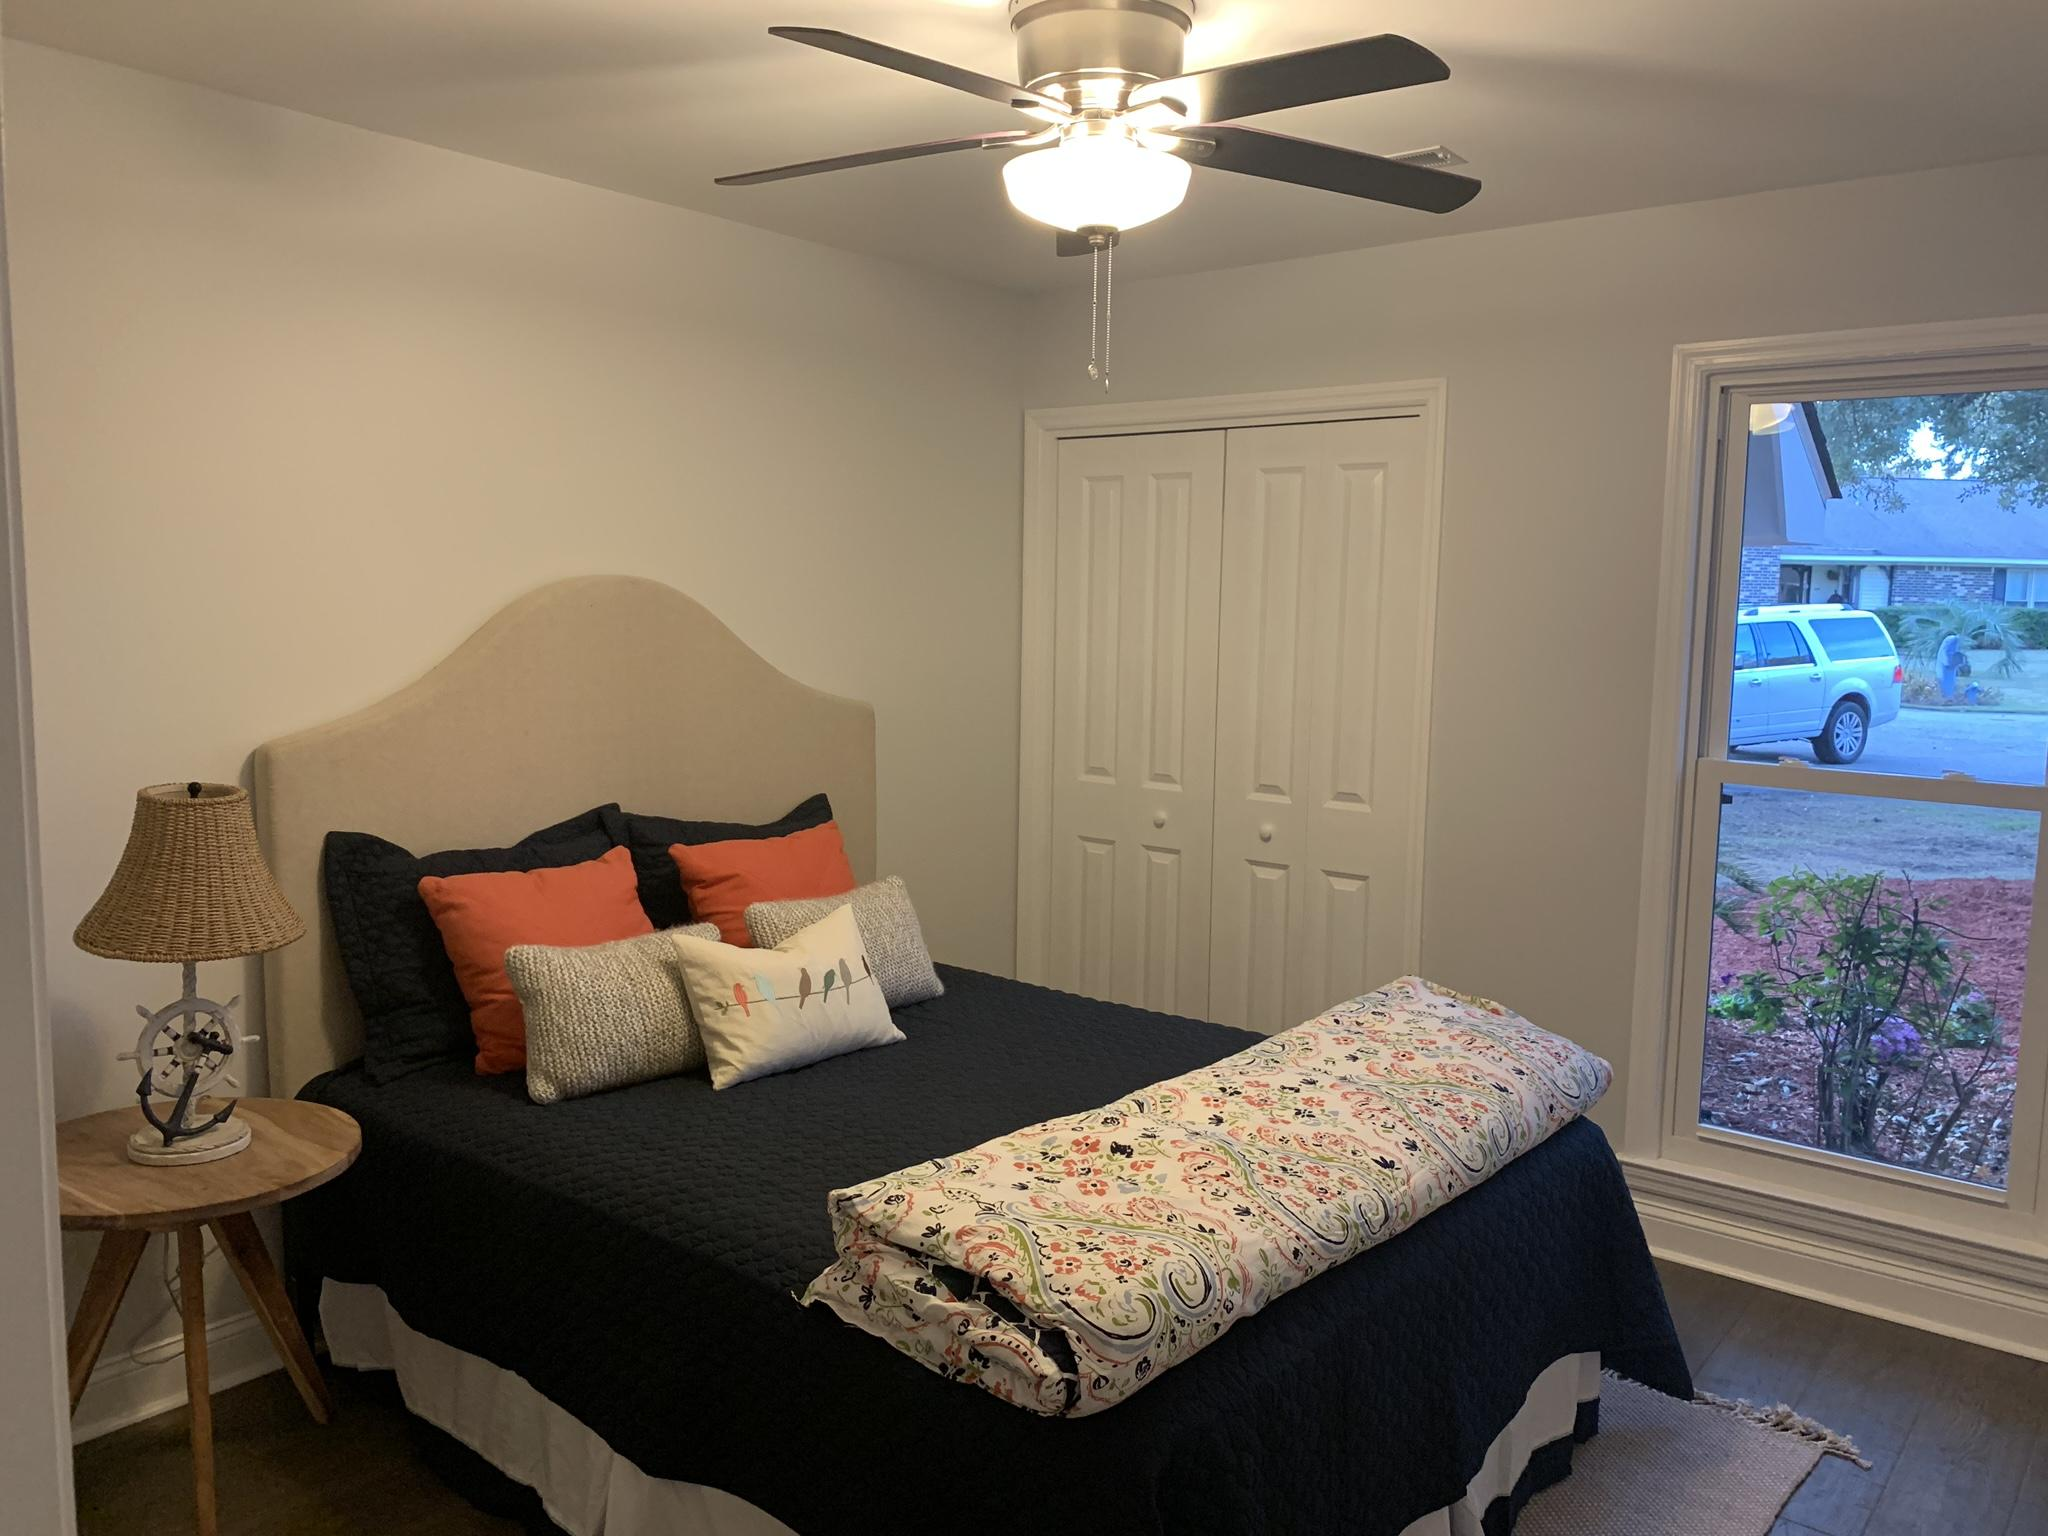 Heathwood Ext Homes For Sale - 2 Blaine, Charleston, SC - 4